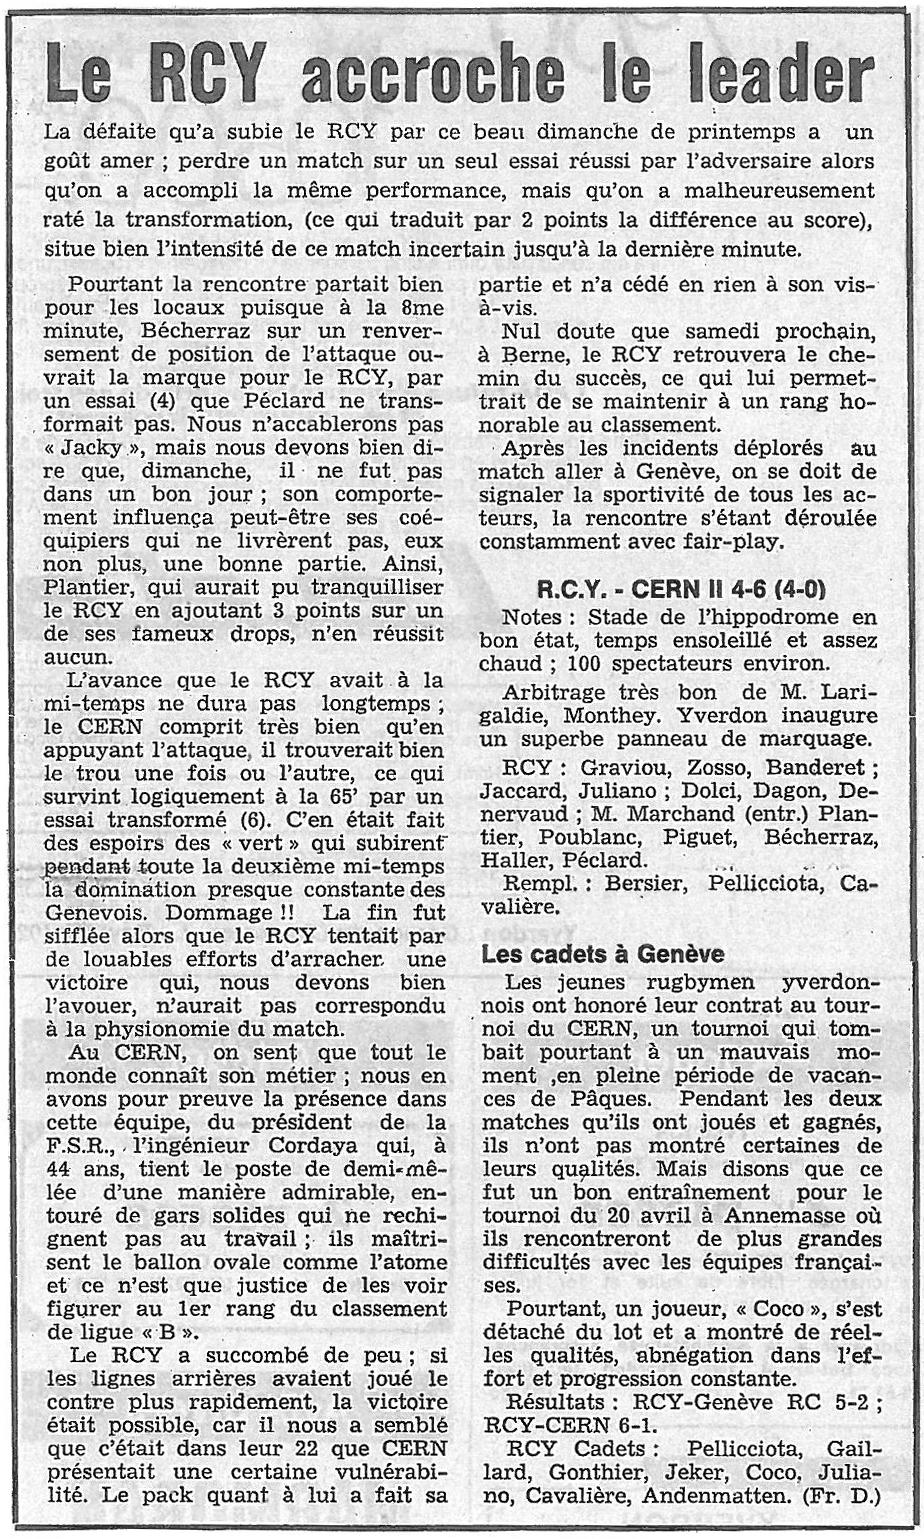 13 avril 1975